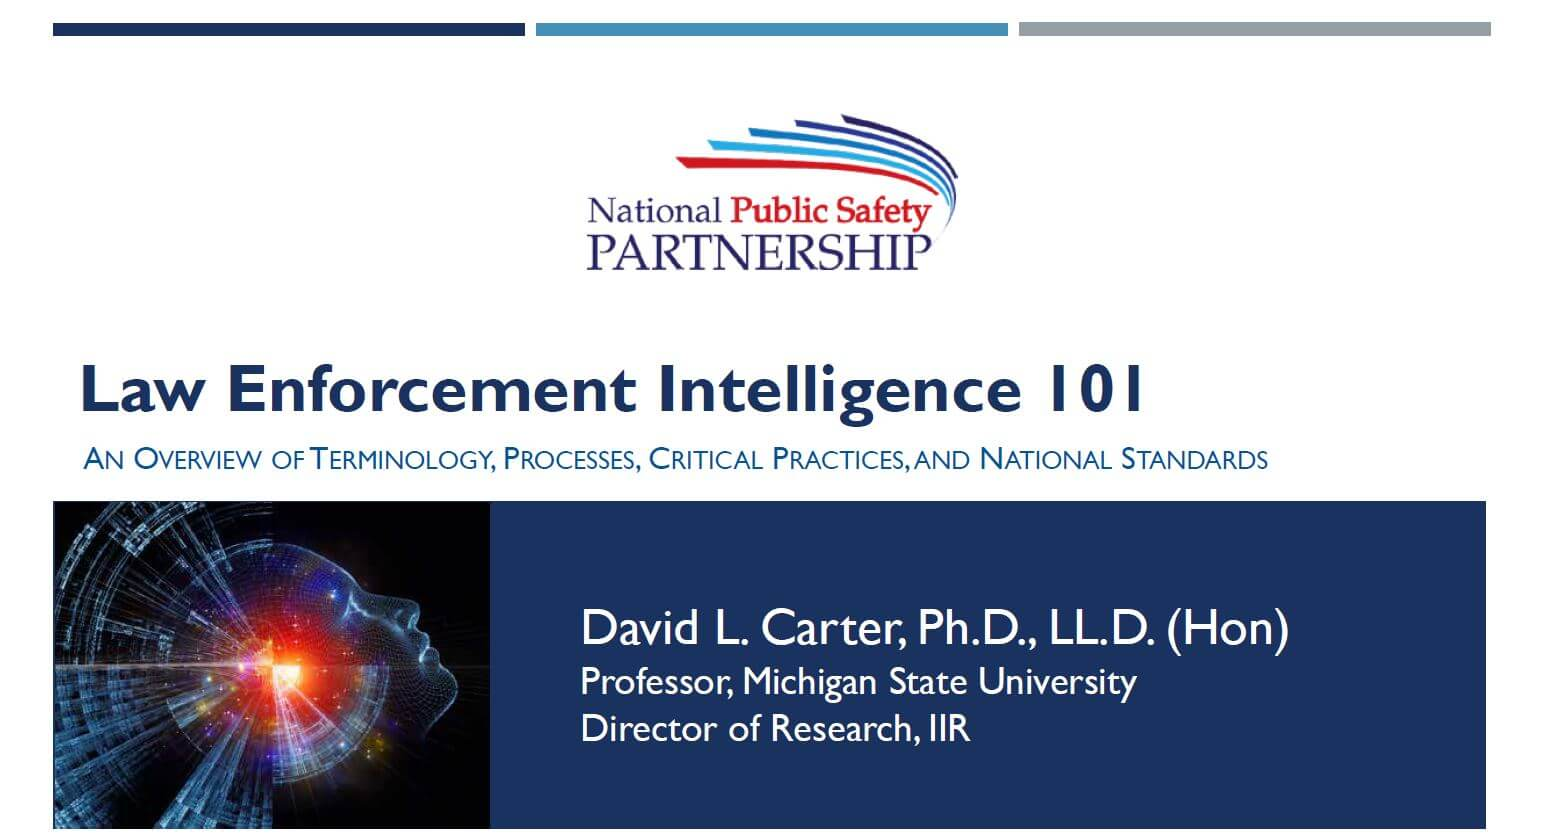 Intelligence 101 slide